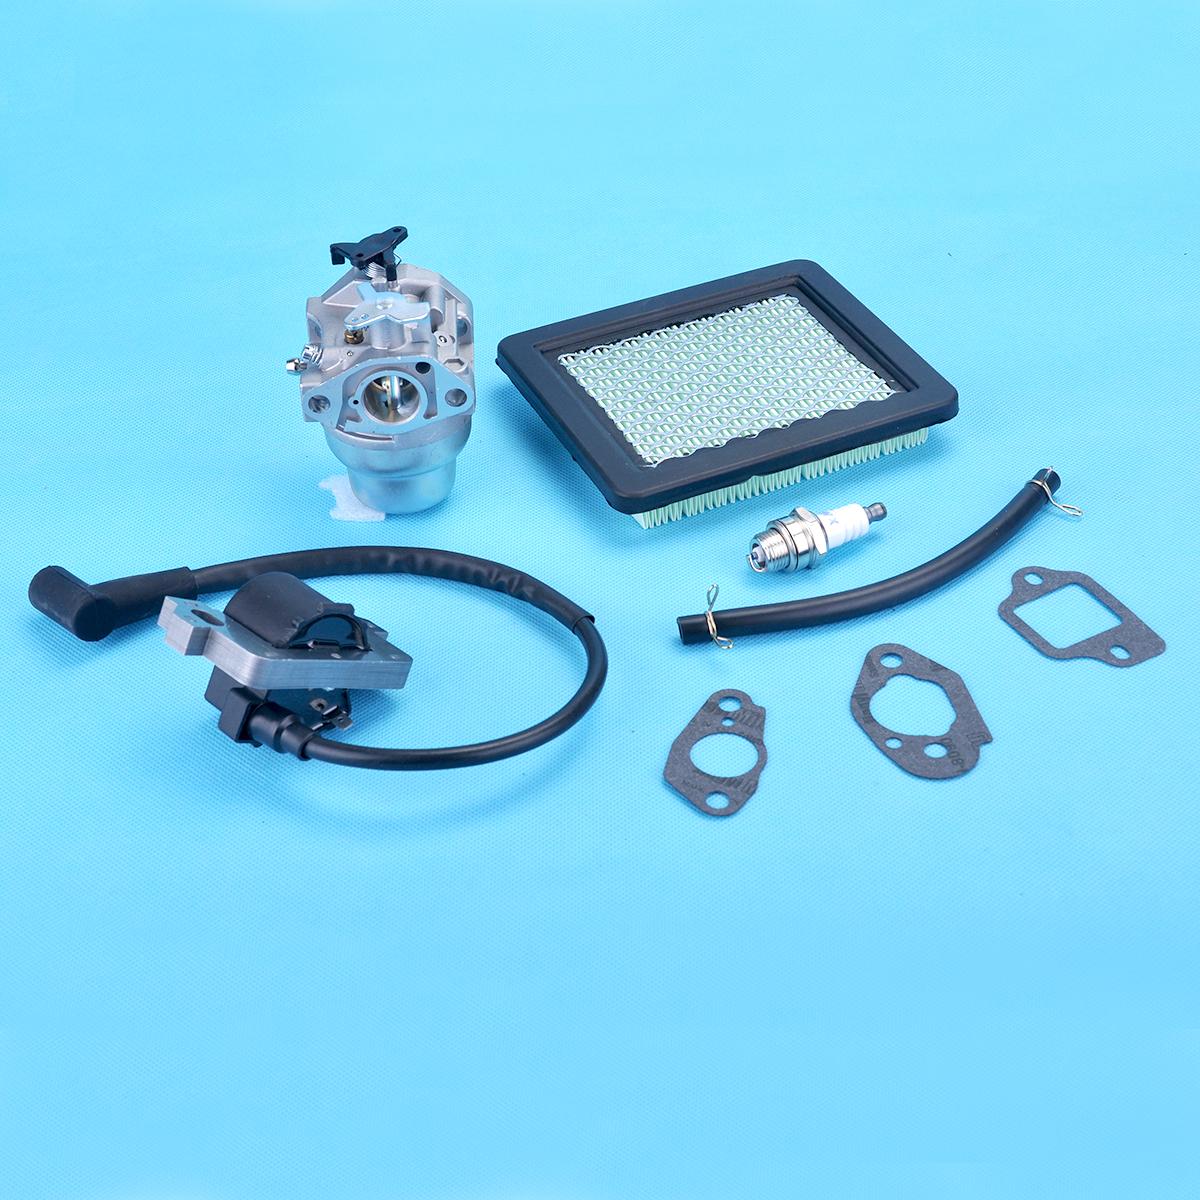 2001 honda accord ex fuel filter carburetor ignition coil for honda gcv160 hrb216 hrs216 ... honda harmony hrb216 fuel filter #10